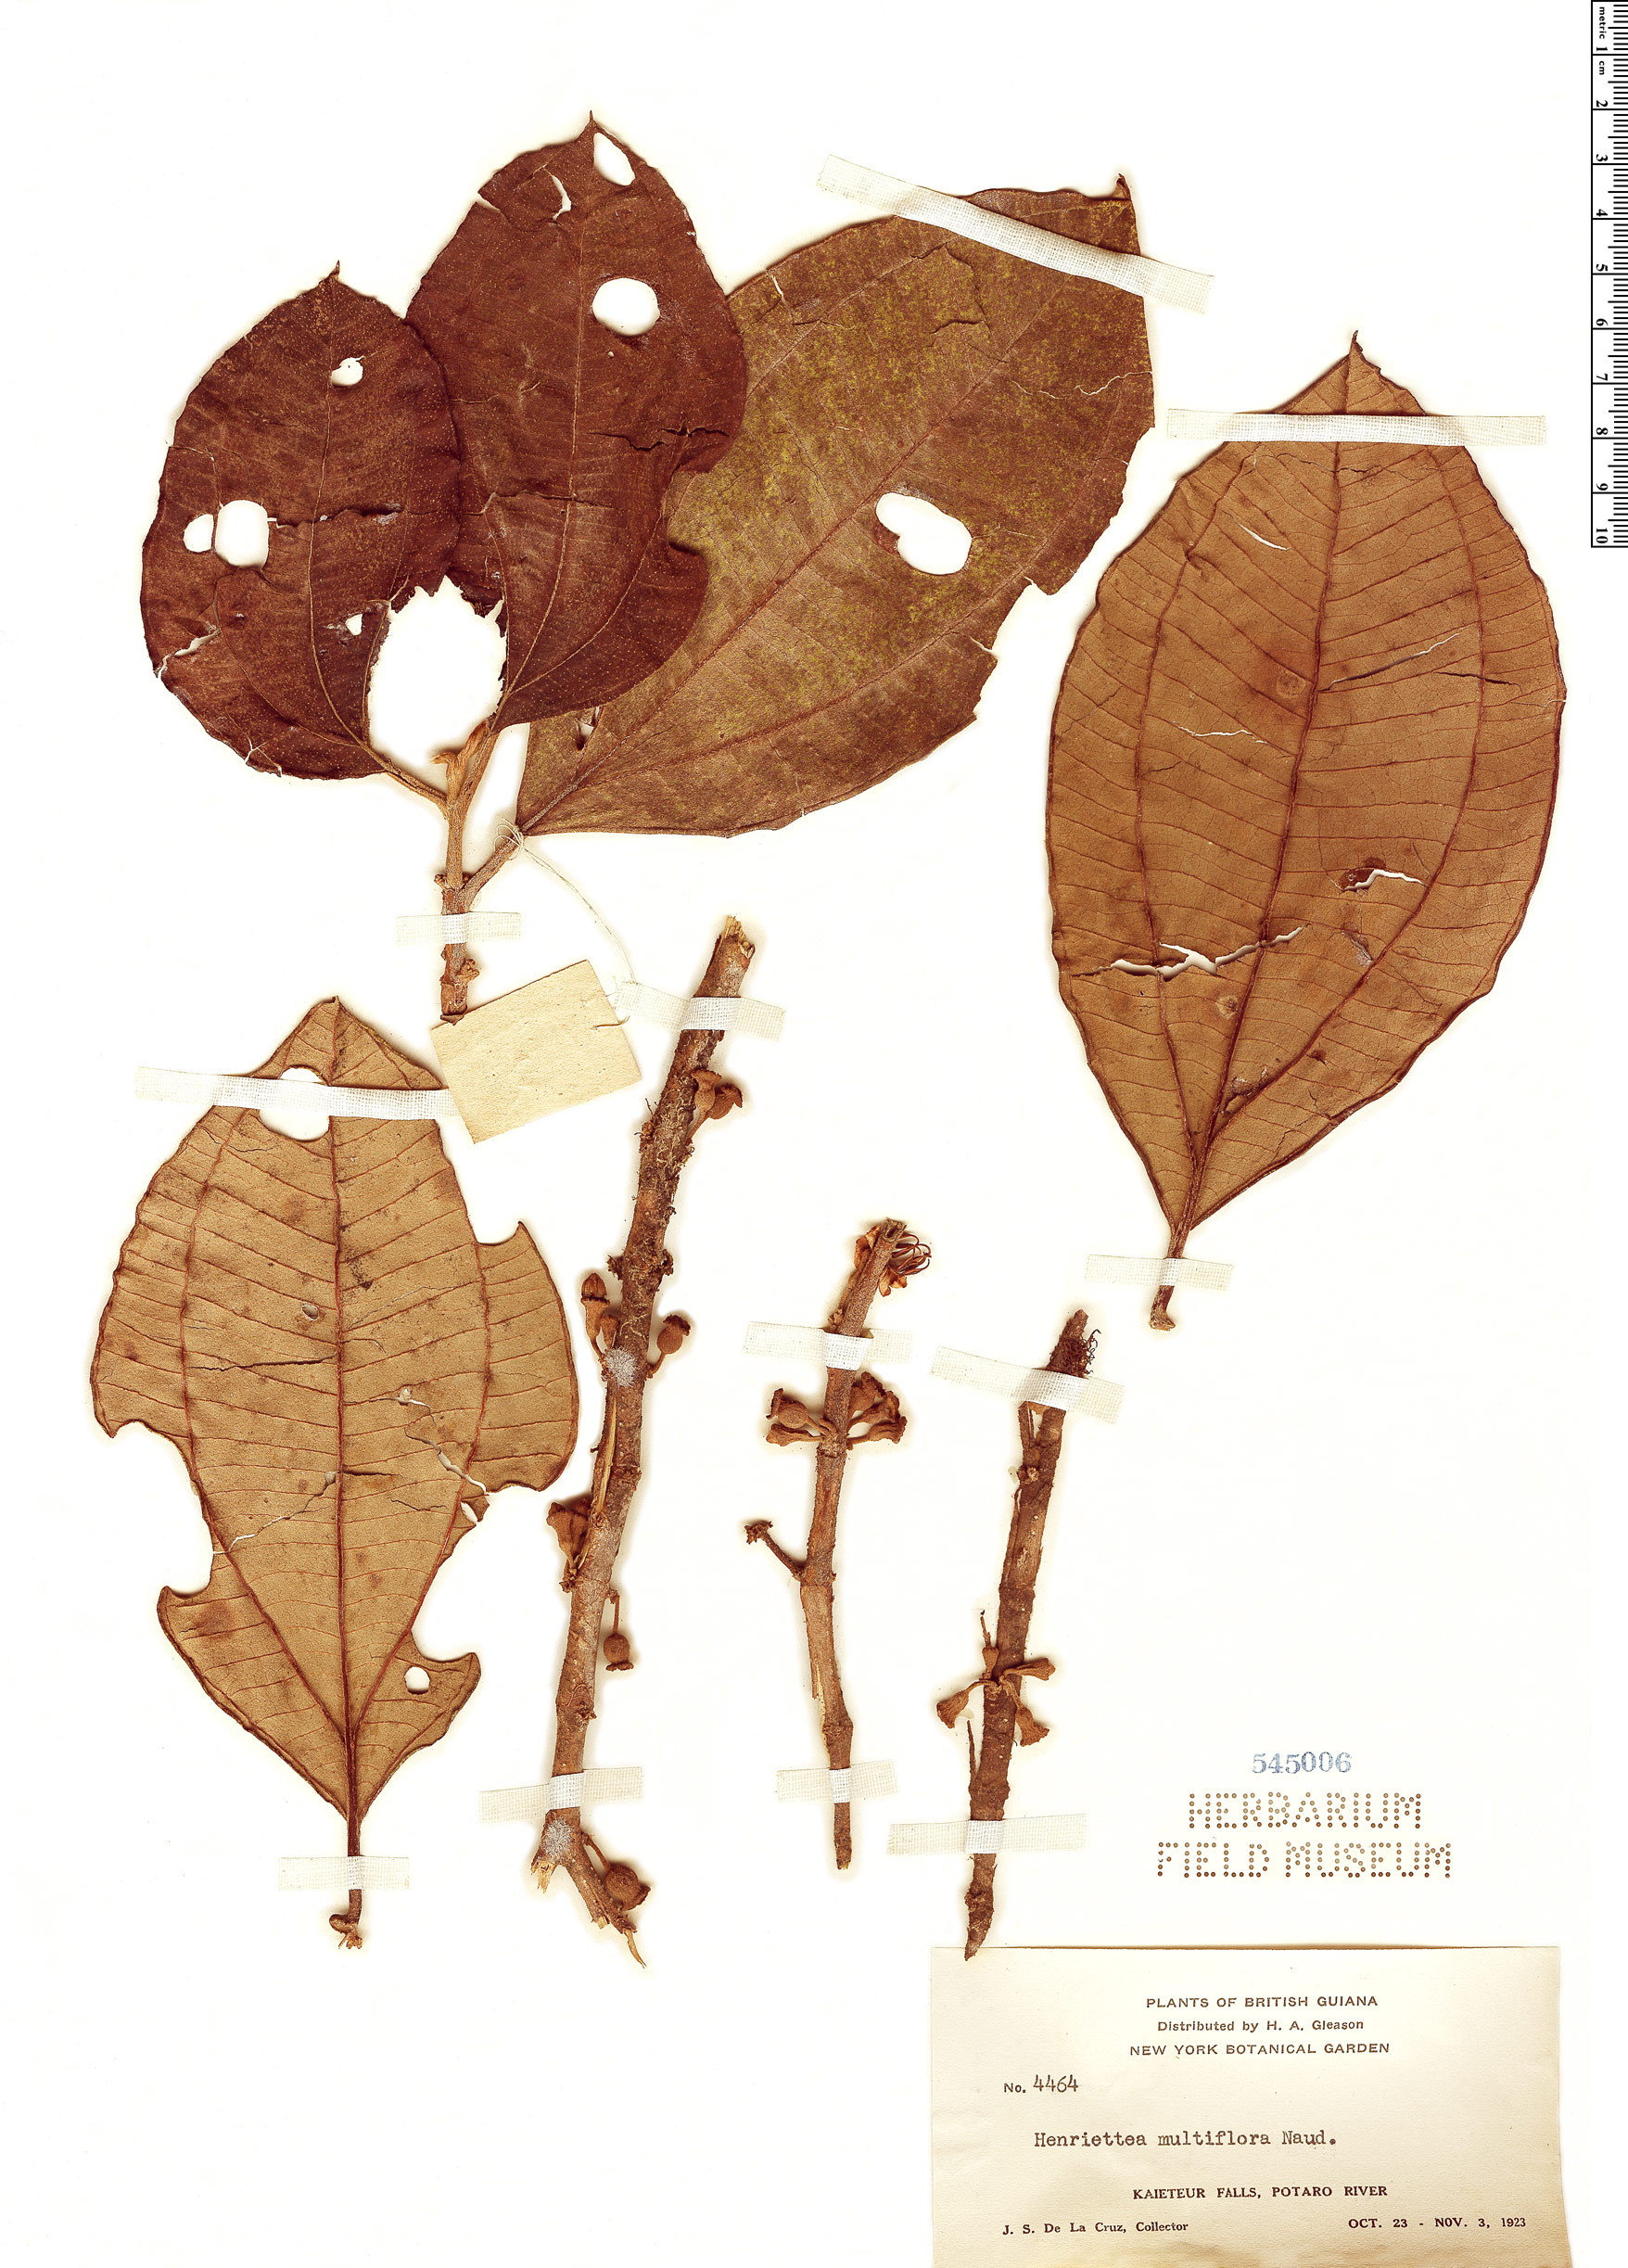 Specimen: Henriettea multiflora